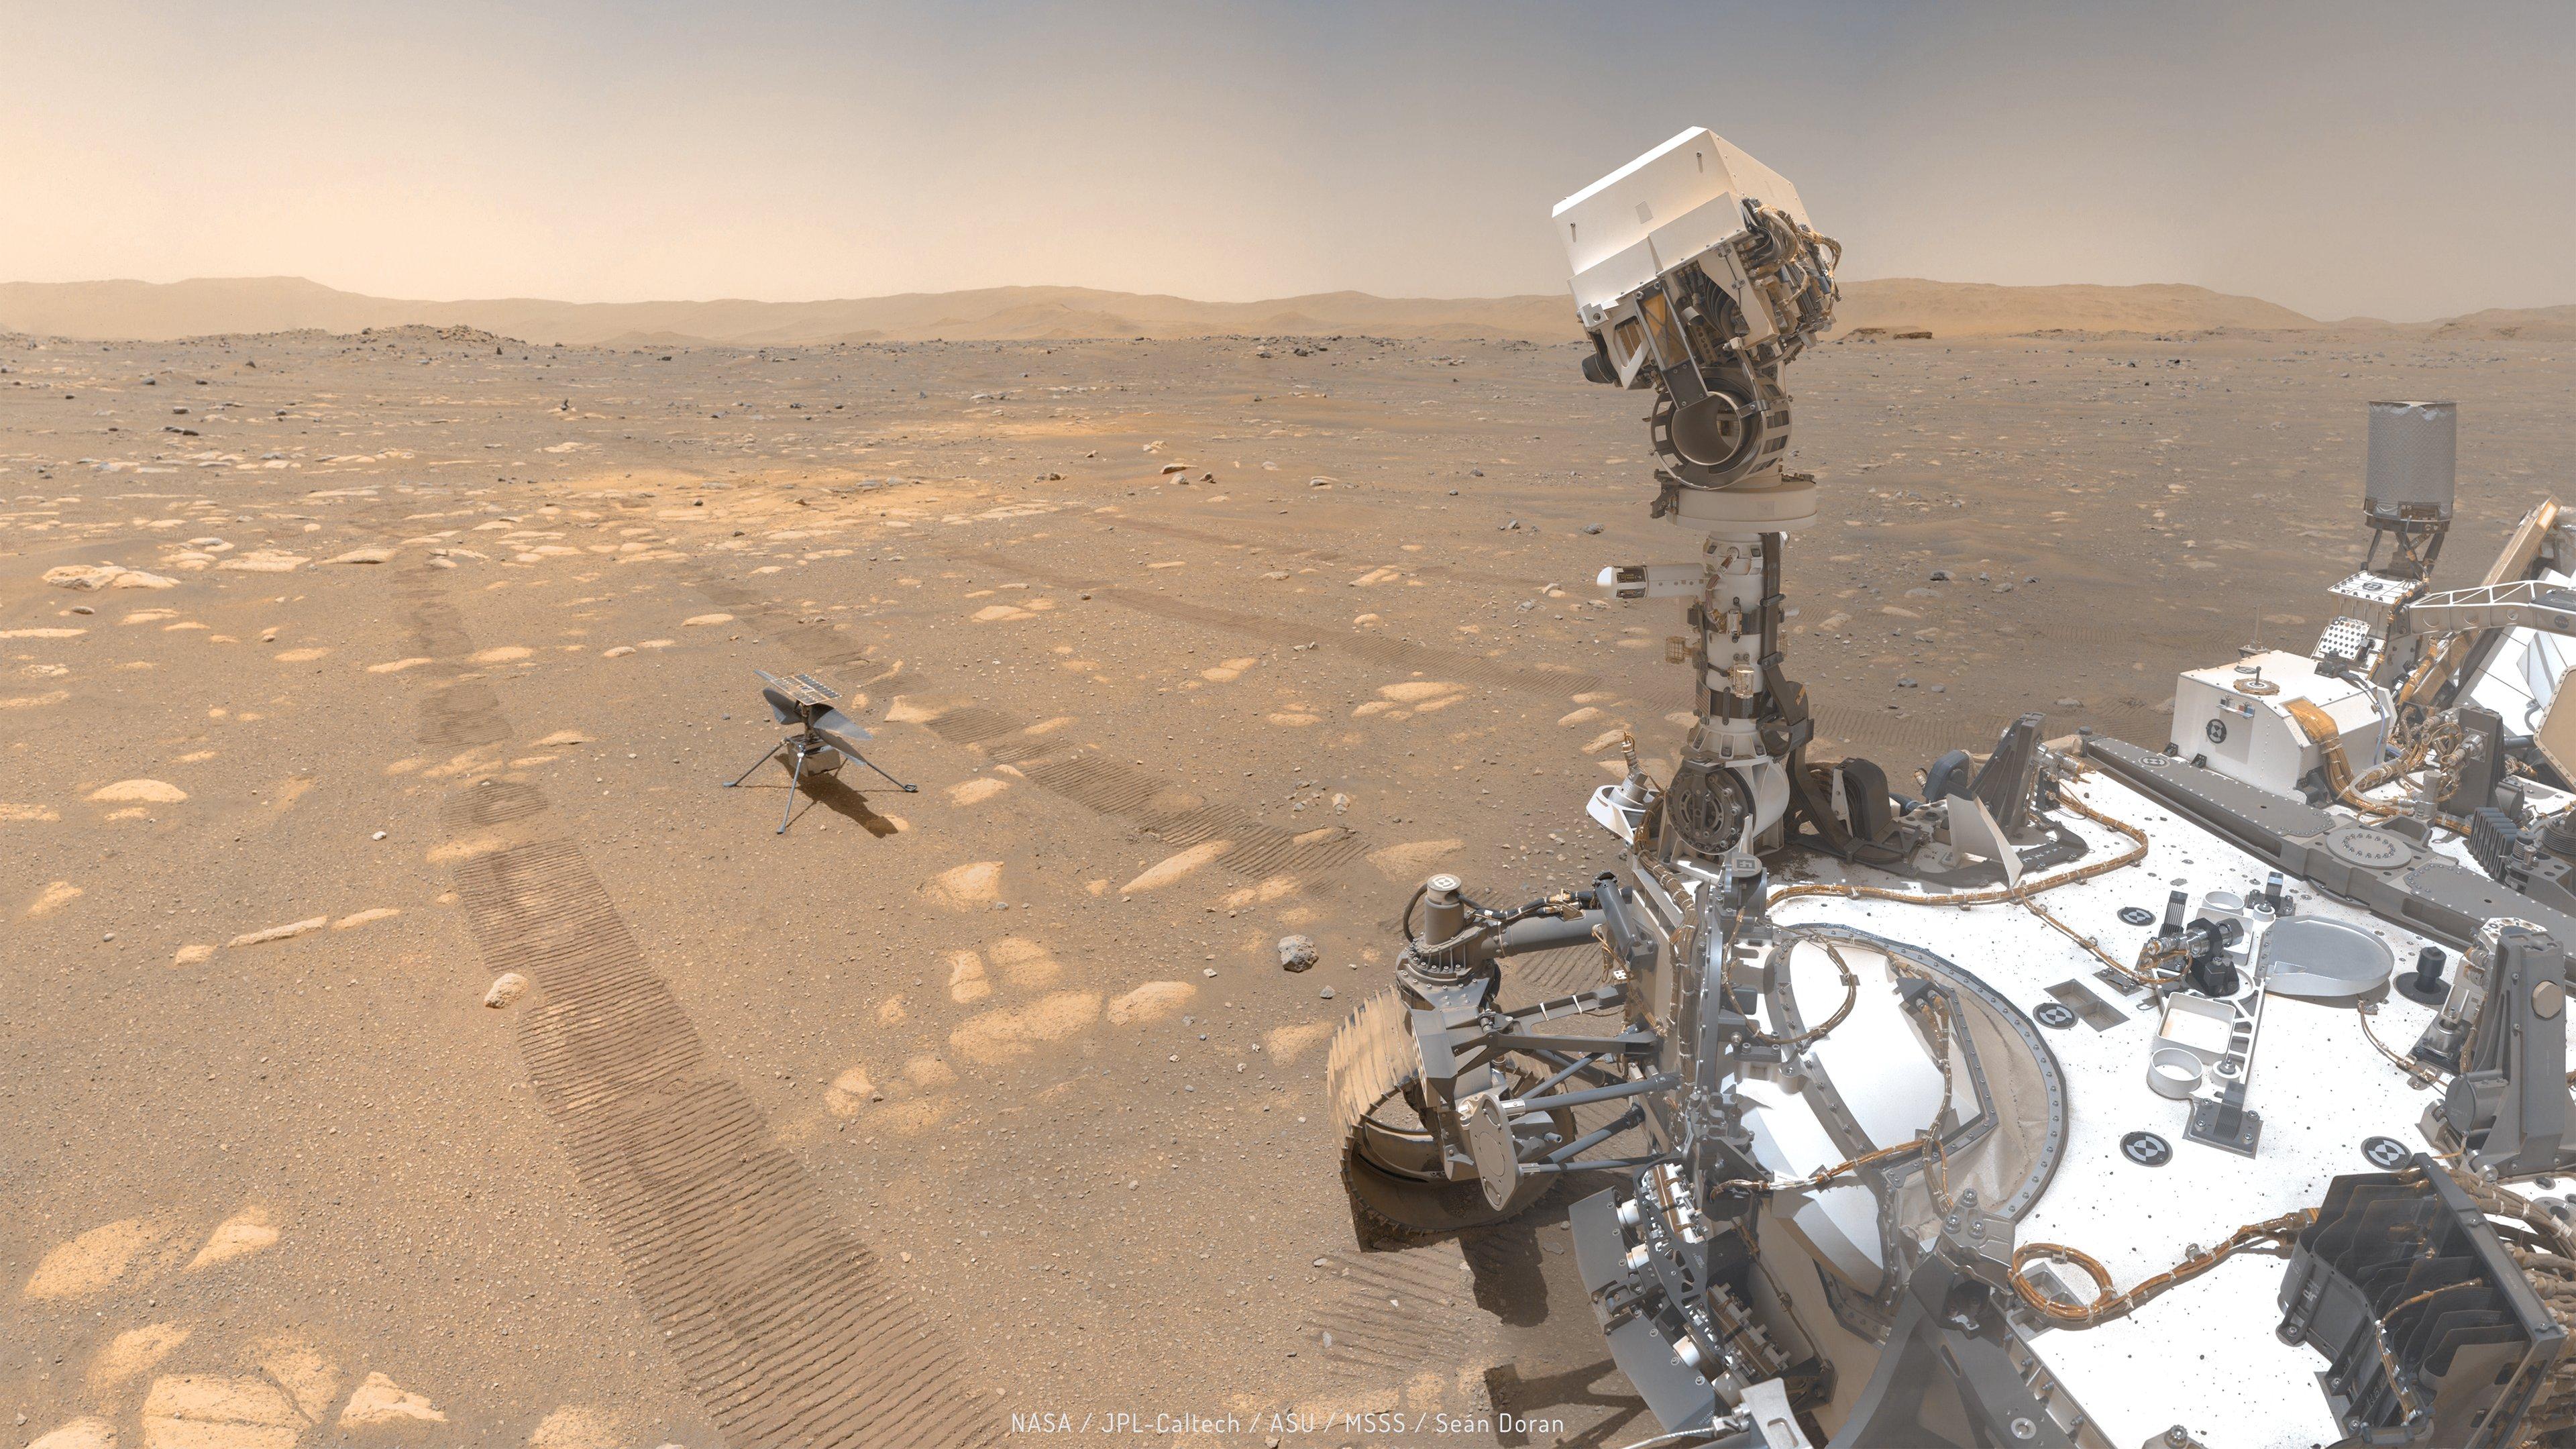 Mars 2020 (Perseverance) : exploration du cratère Jezero - Page 8 EyWM7t6WQAAl1Rd?format=jpg&name=4096x4096